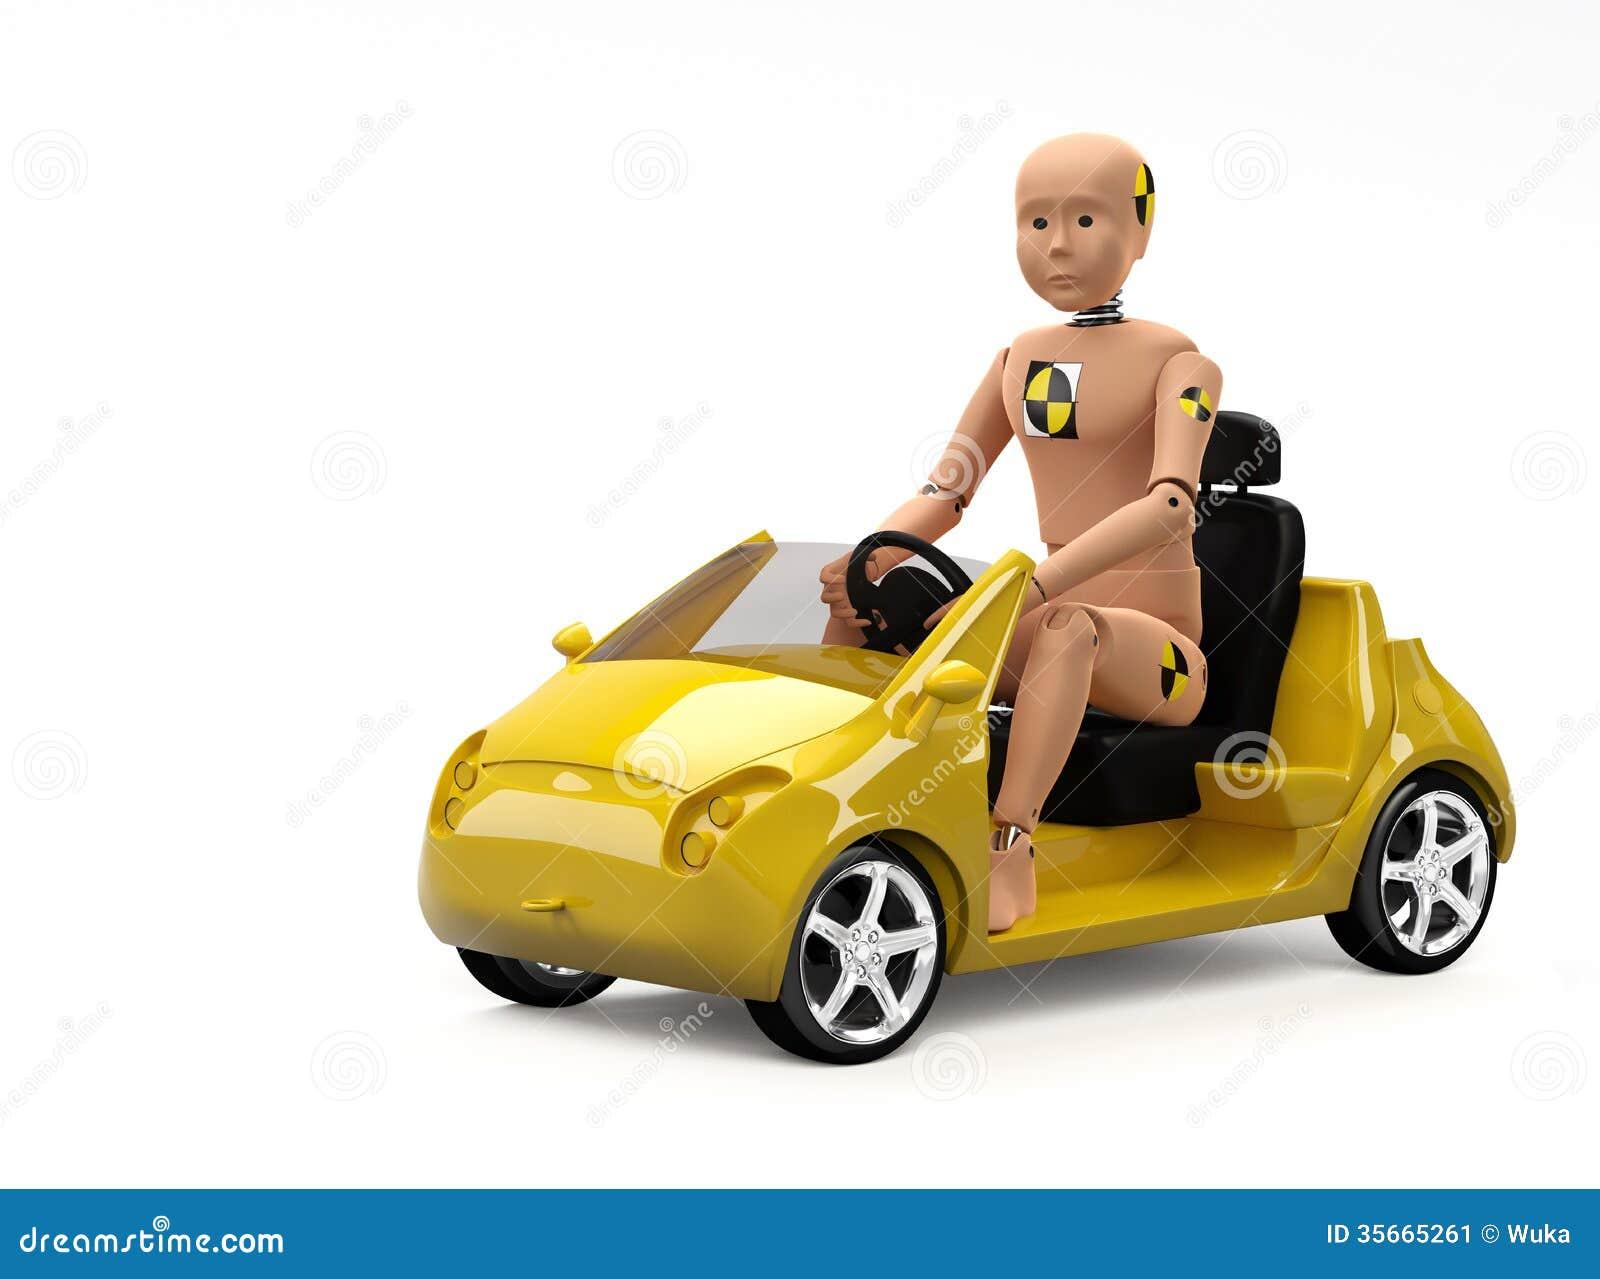 Video Car Crash Test Dummies